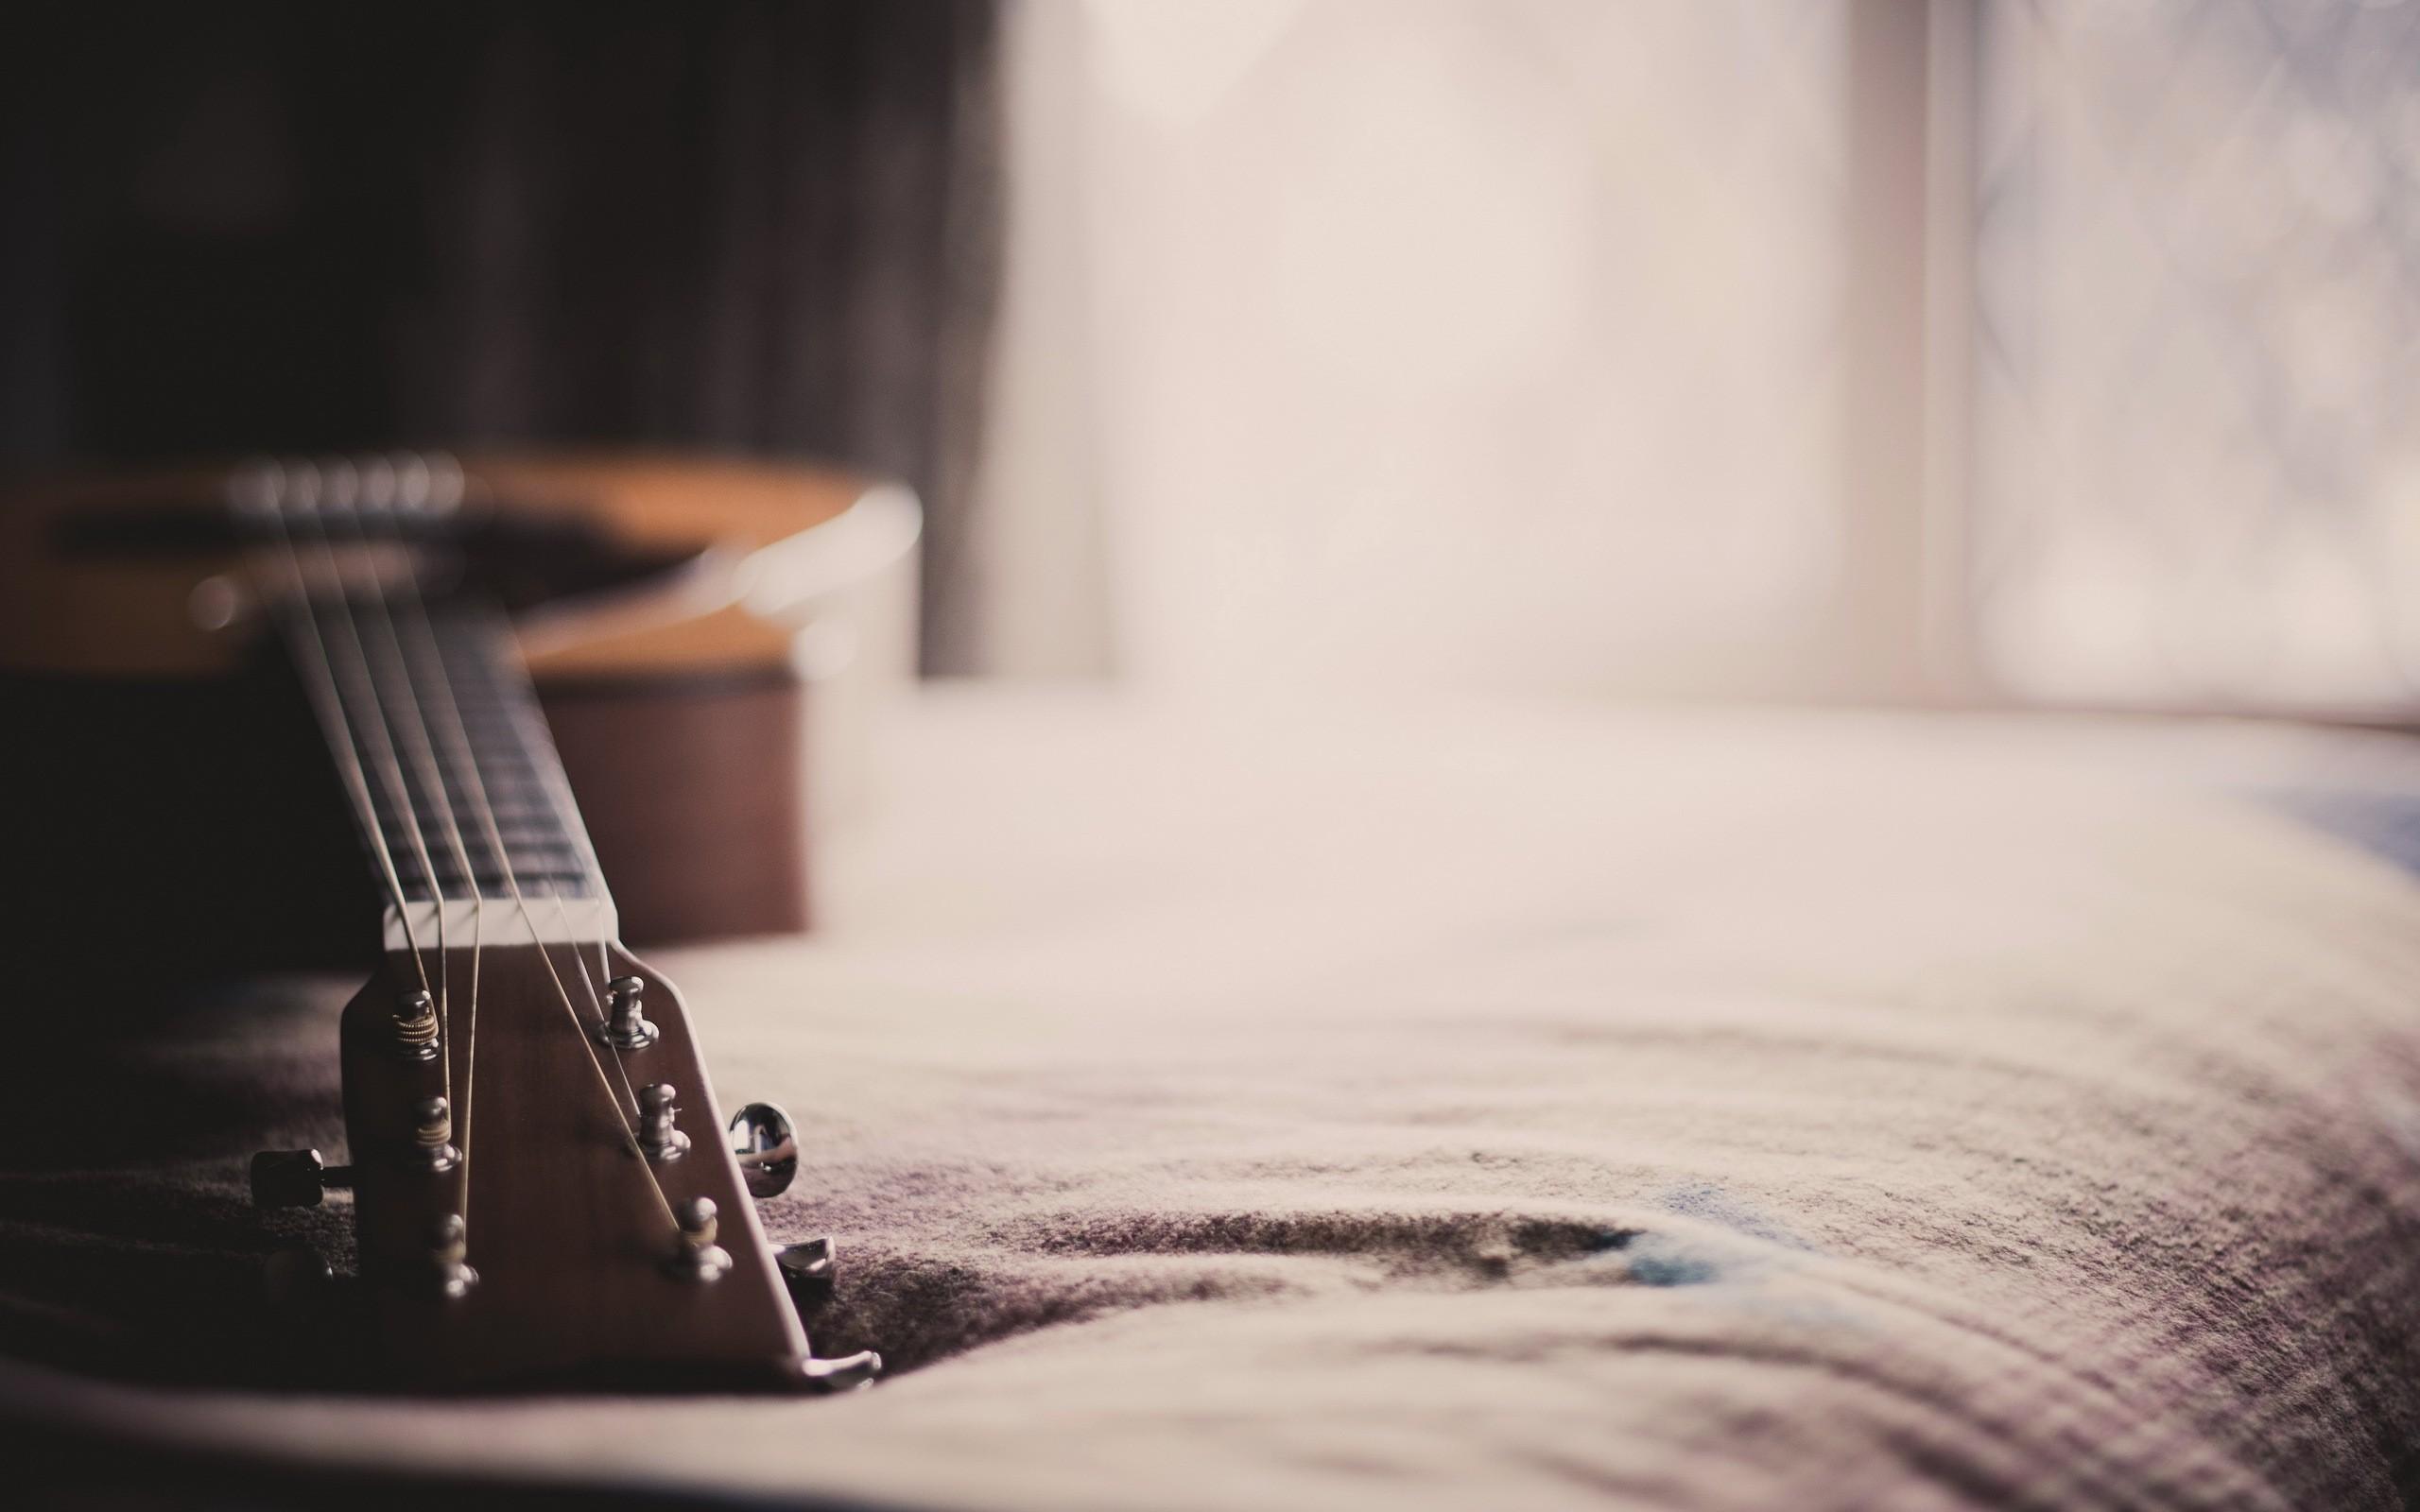 Guitar Wallpaper HD 1